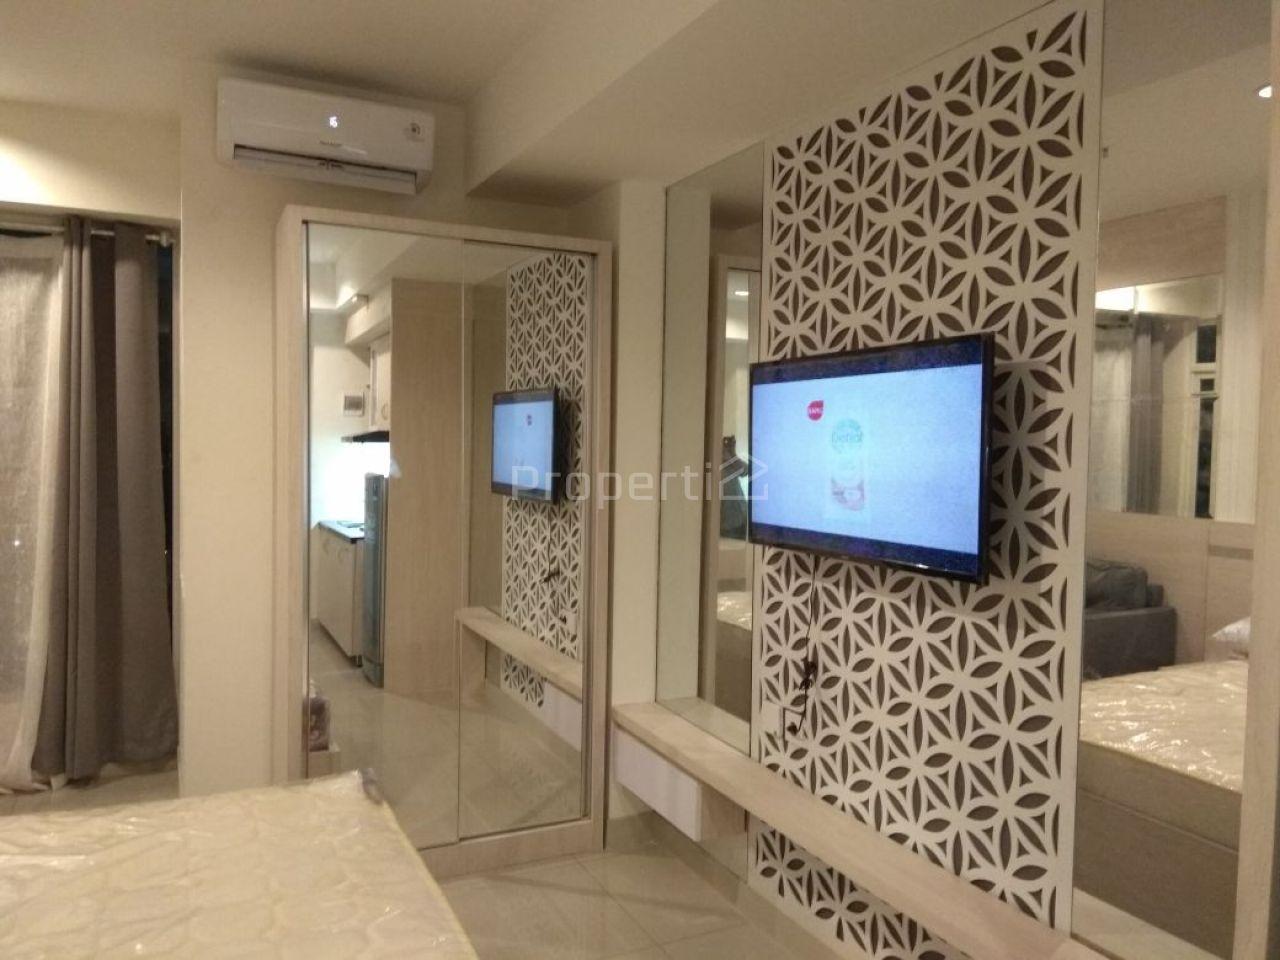 Fully Furnished Studio Unit on 9th Floor Grand Kamala Lagoon, Jawa Barat